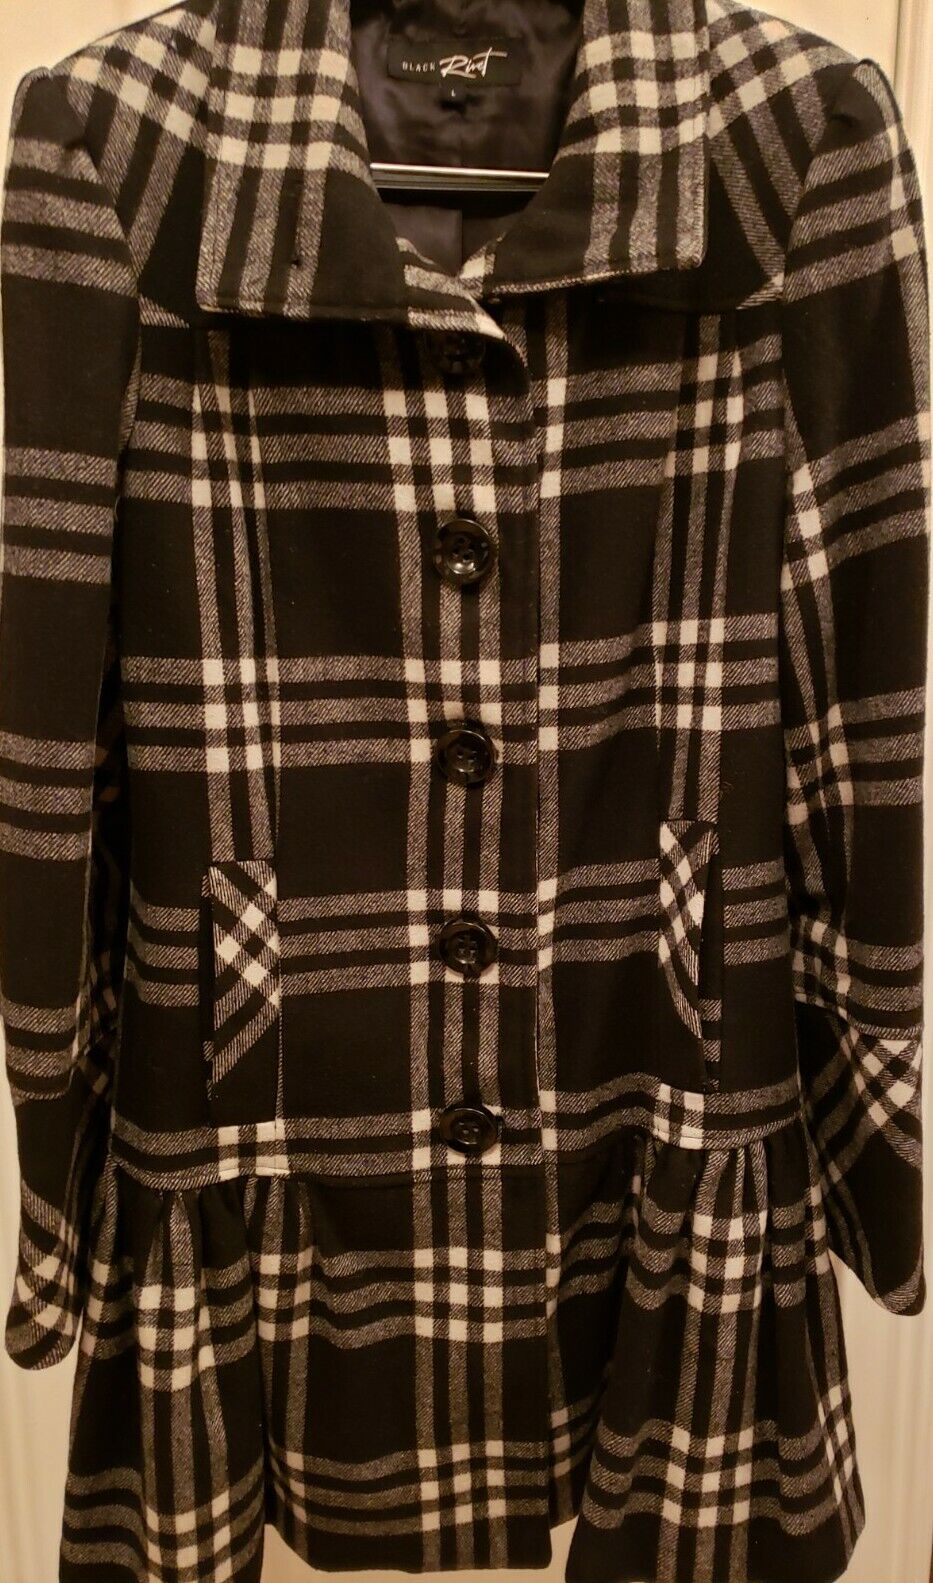 Womens black/white block peplum style wool coat size L - Rivet brand